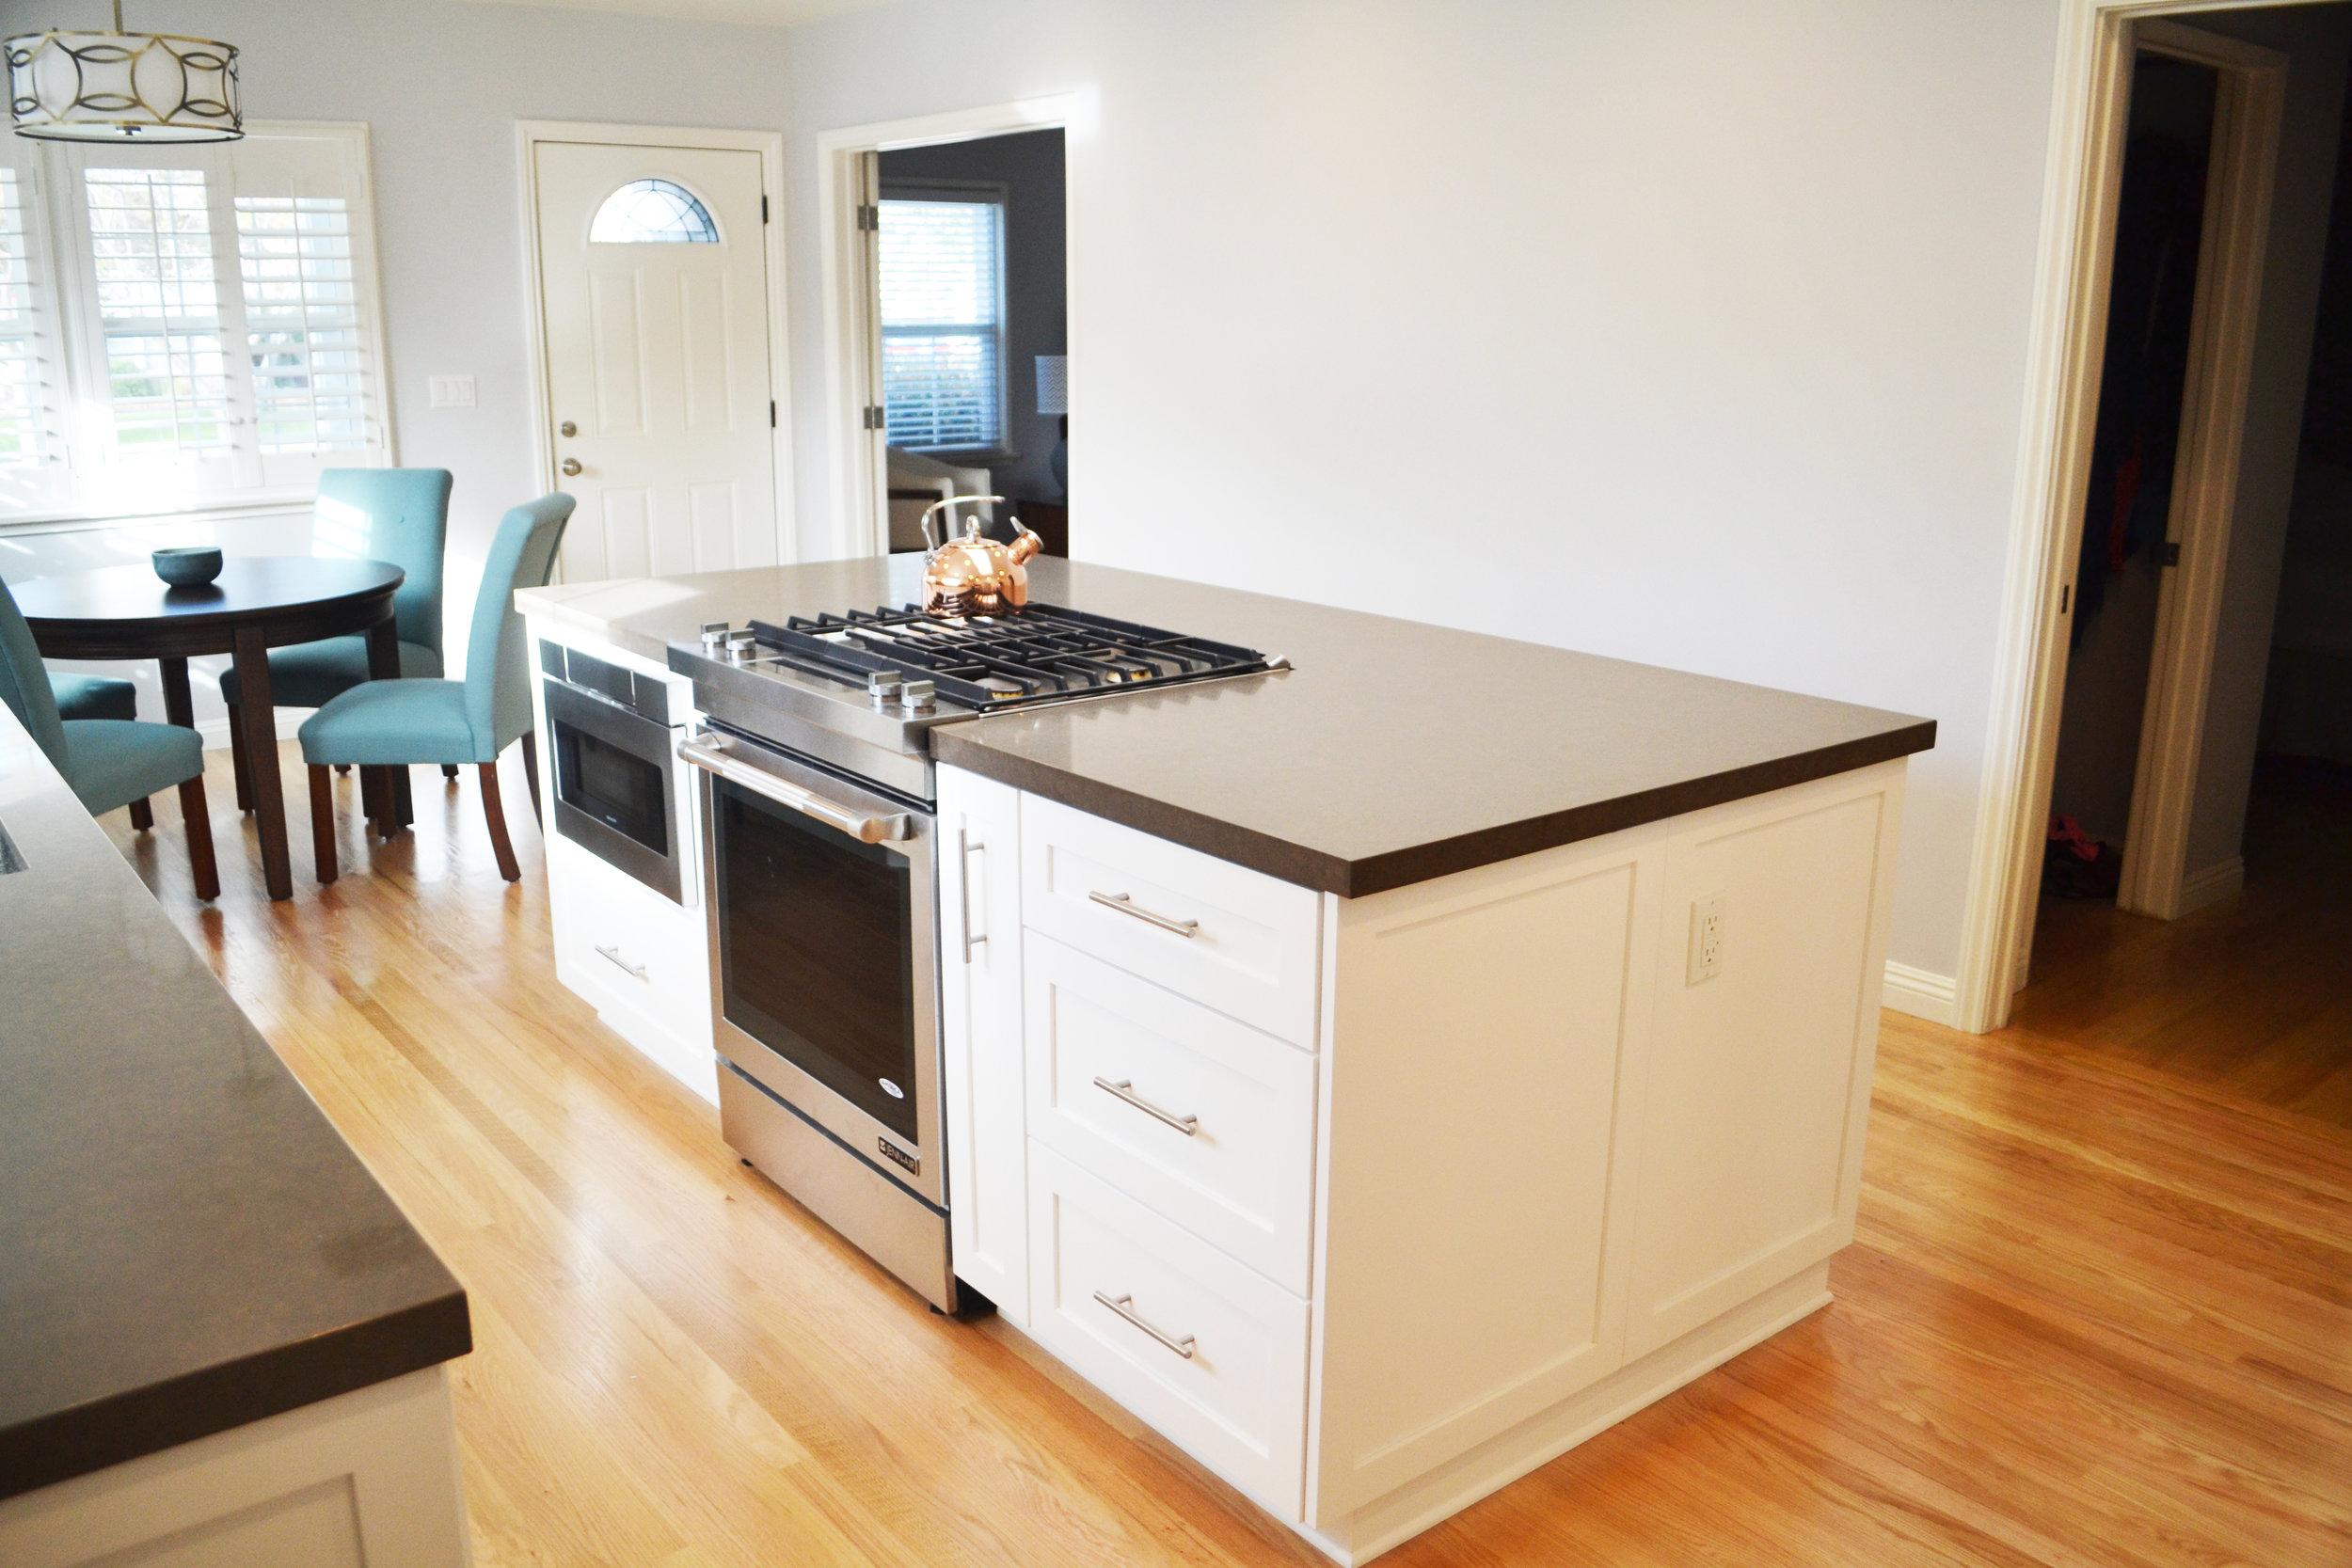 Burbank kitchen remodel